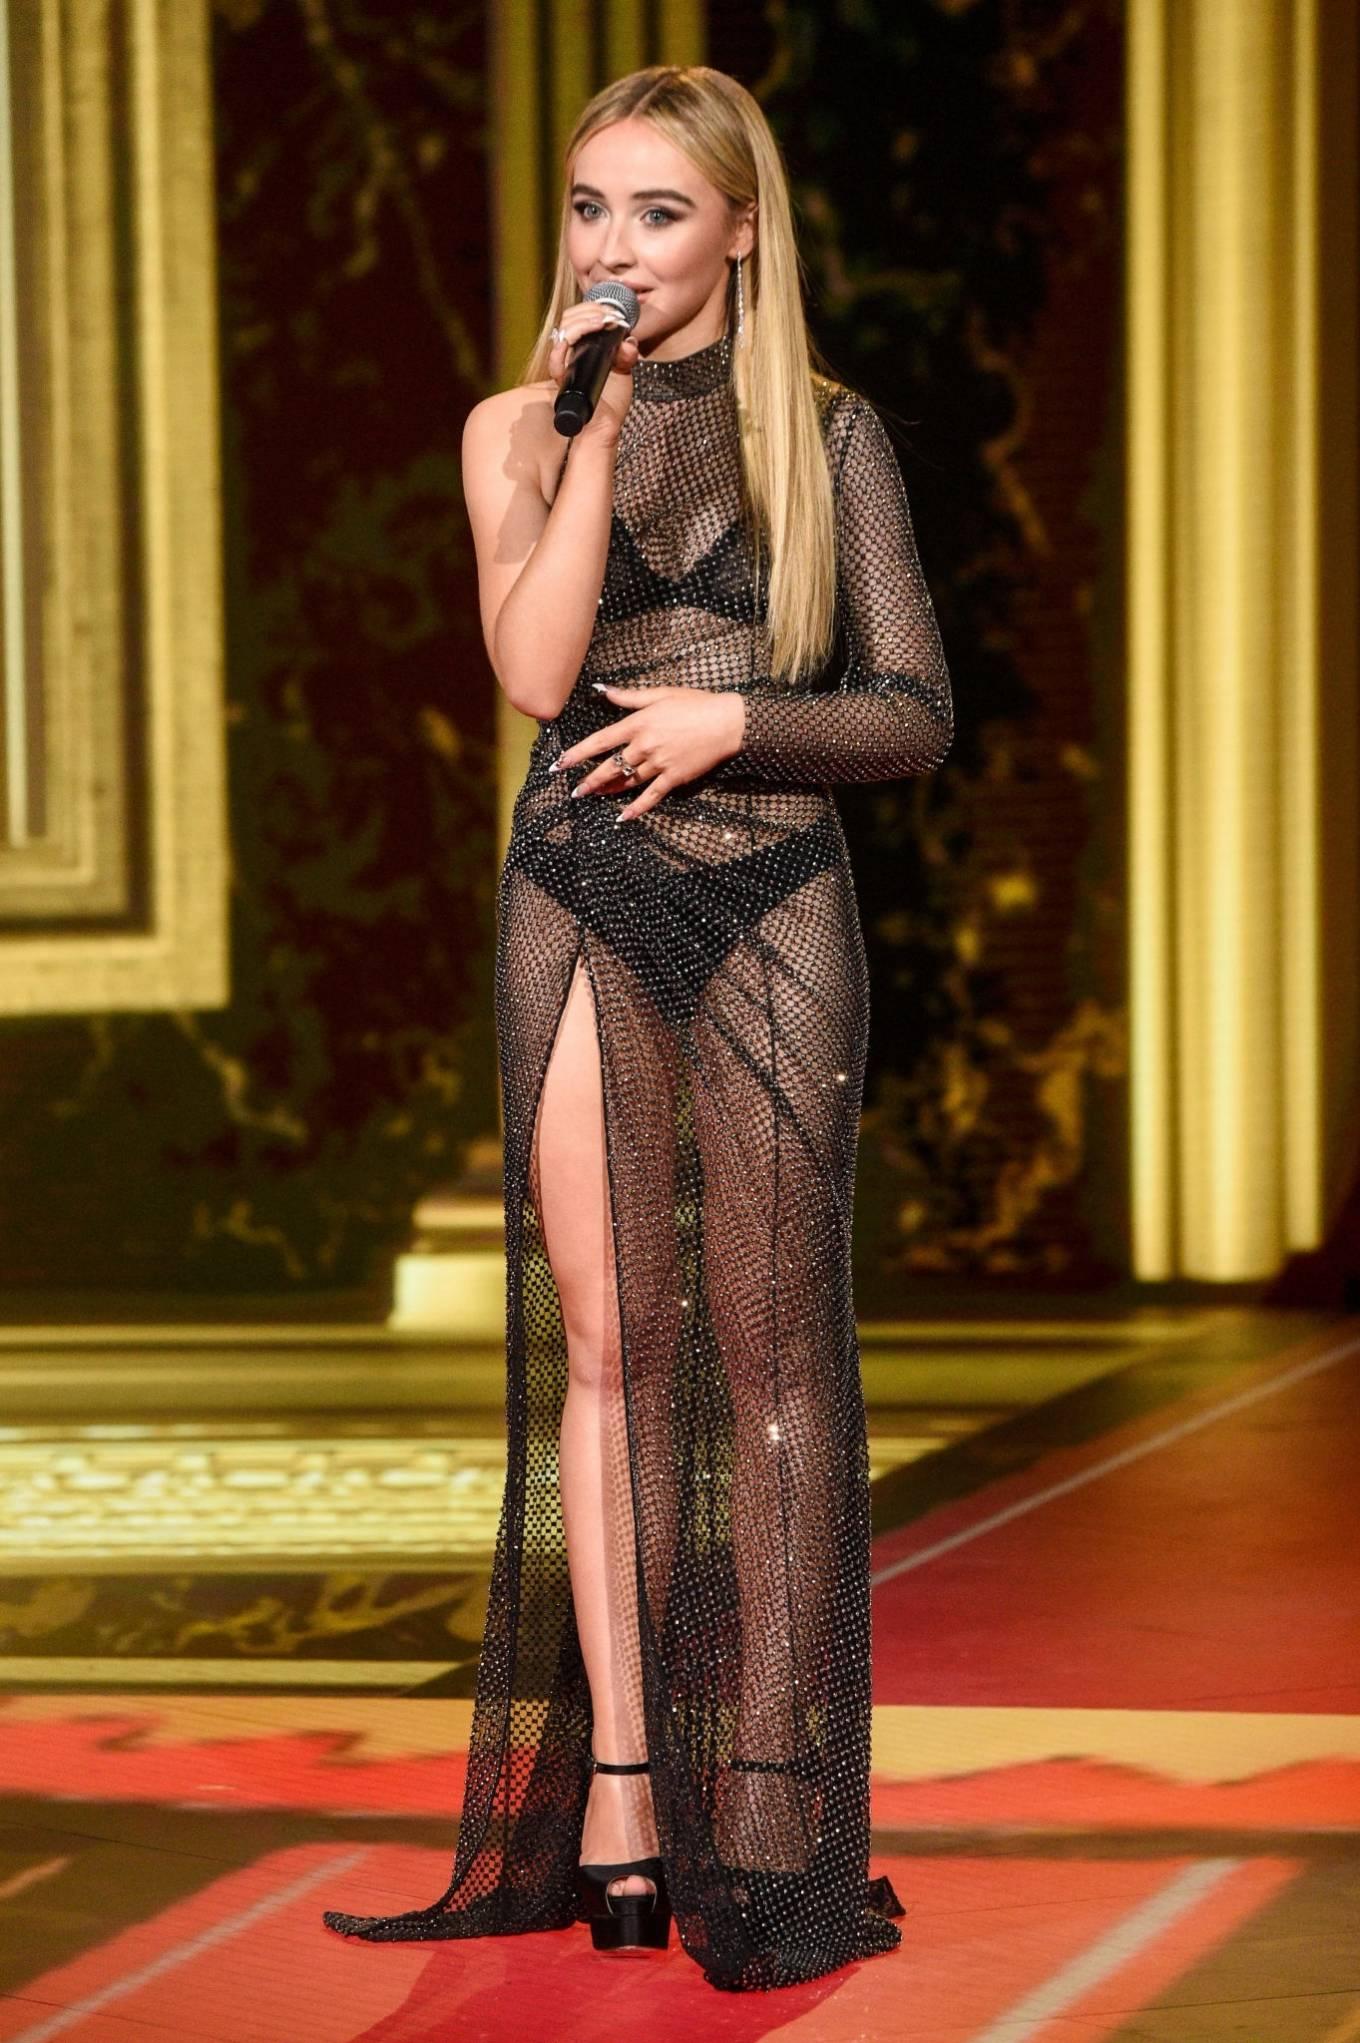 Sabrina Carpenter 2020 : Sabrina Carpenter – 2020 MTV Movie and TV Awards: GOAT in LA-05